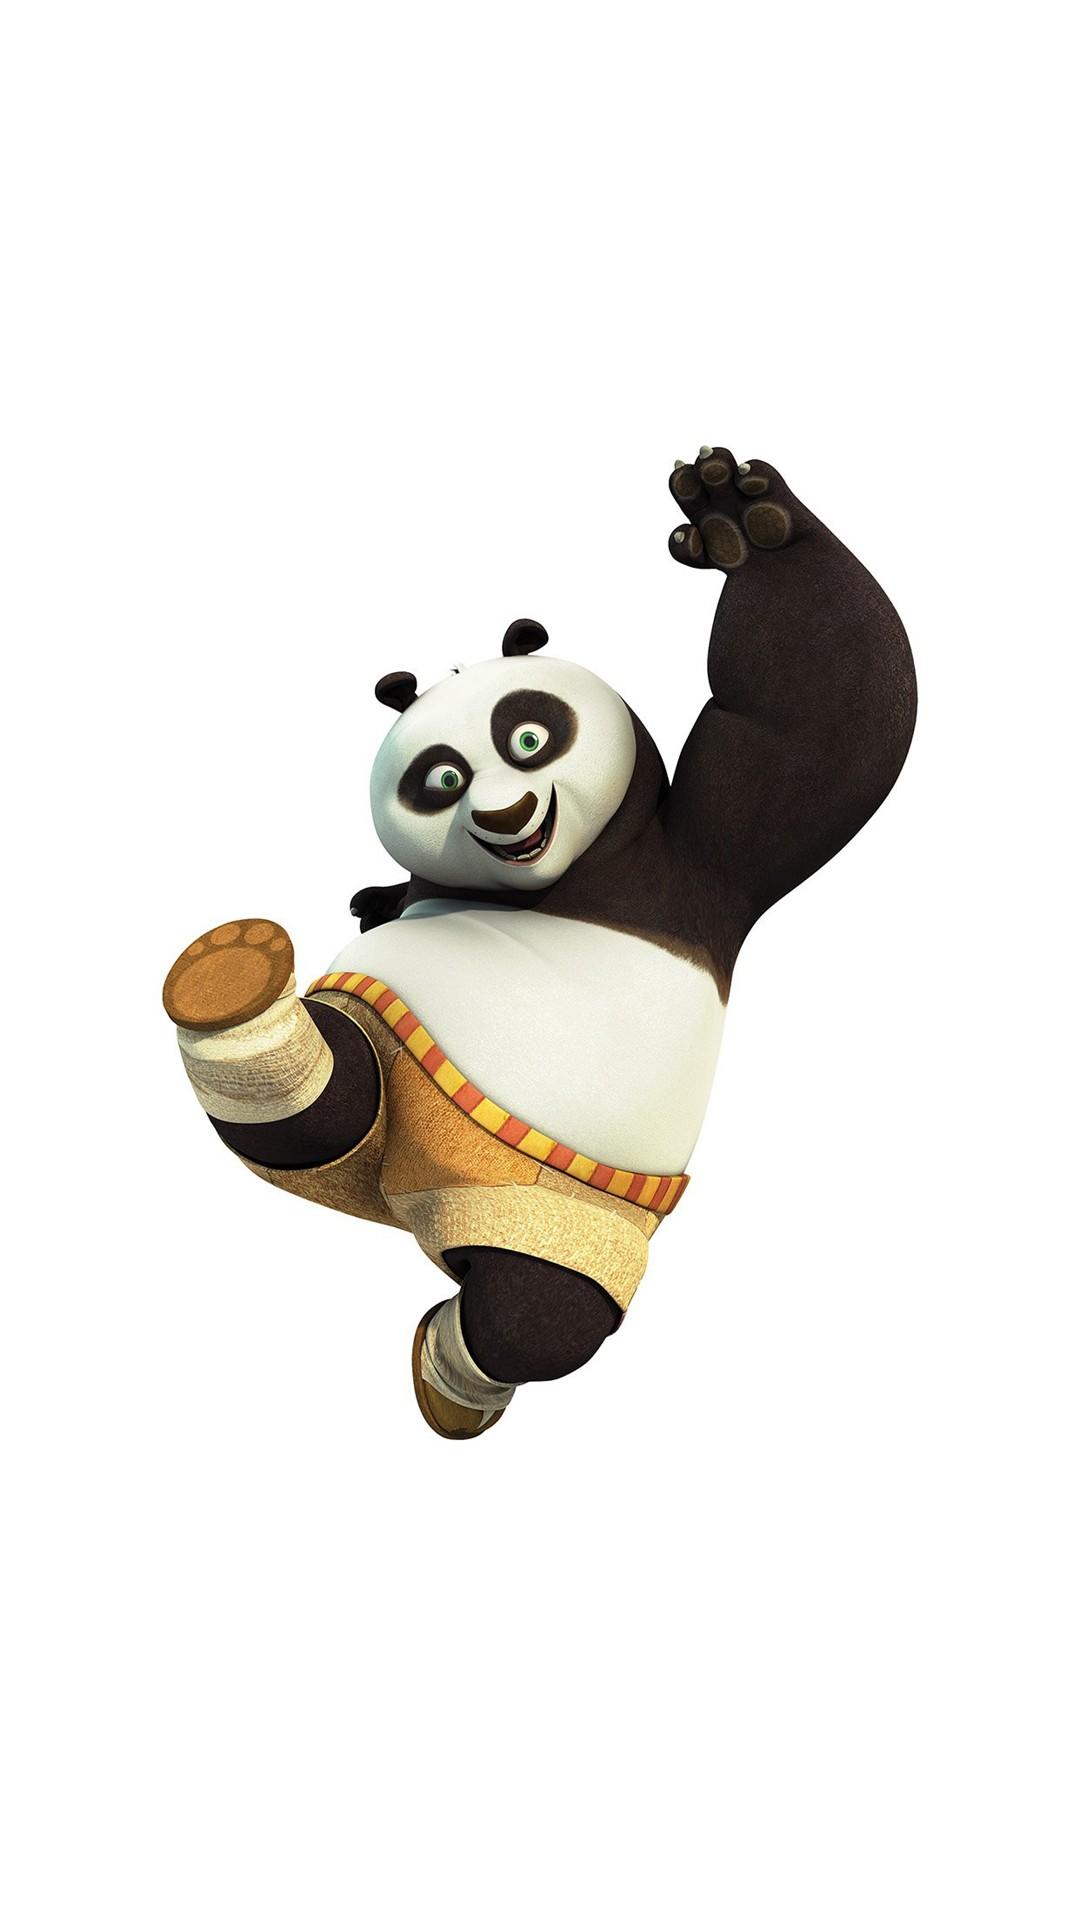 Kungfu Panda Animal Dreamworks Kick Cute Anime #iPhone #6 #plus #wallpaper